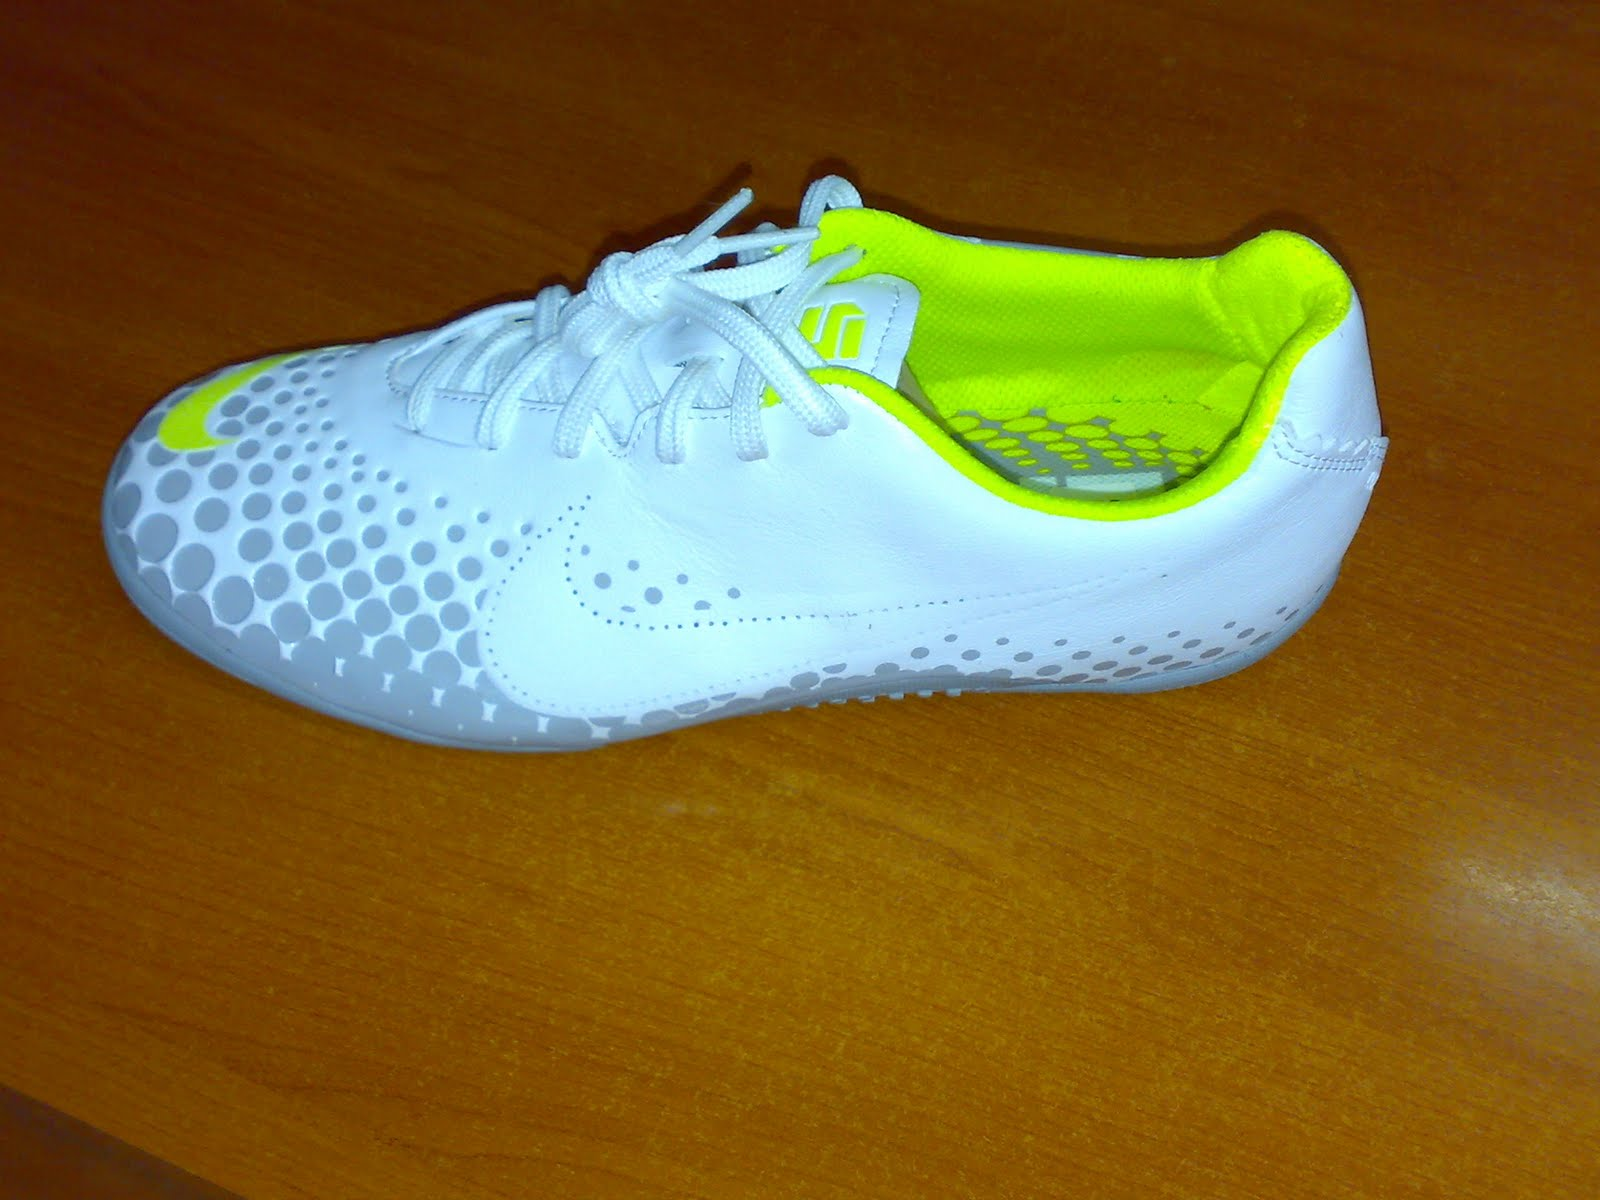 Sweden Toko Online Sepatu Futsal Nike Hypervenom 6483d 957ac Phelon Ii Ic 749898 703 Hijau Italy Murah Original Adidas Diadora Lotto Puma 075b0 A5444